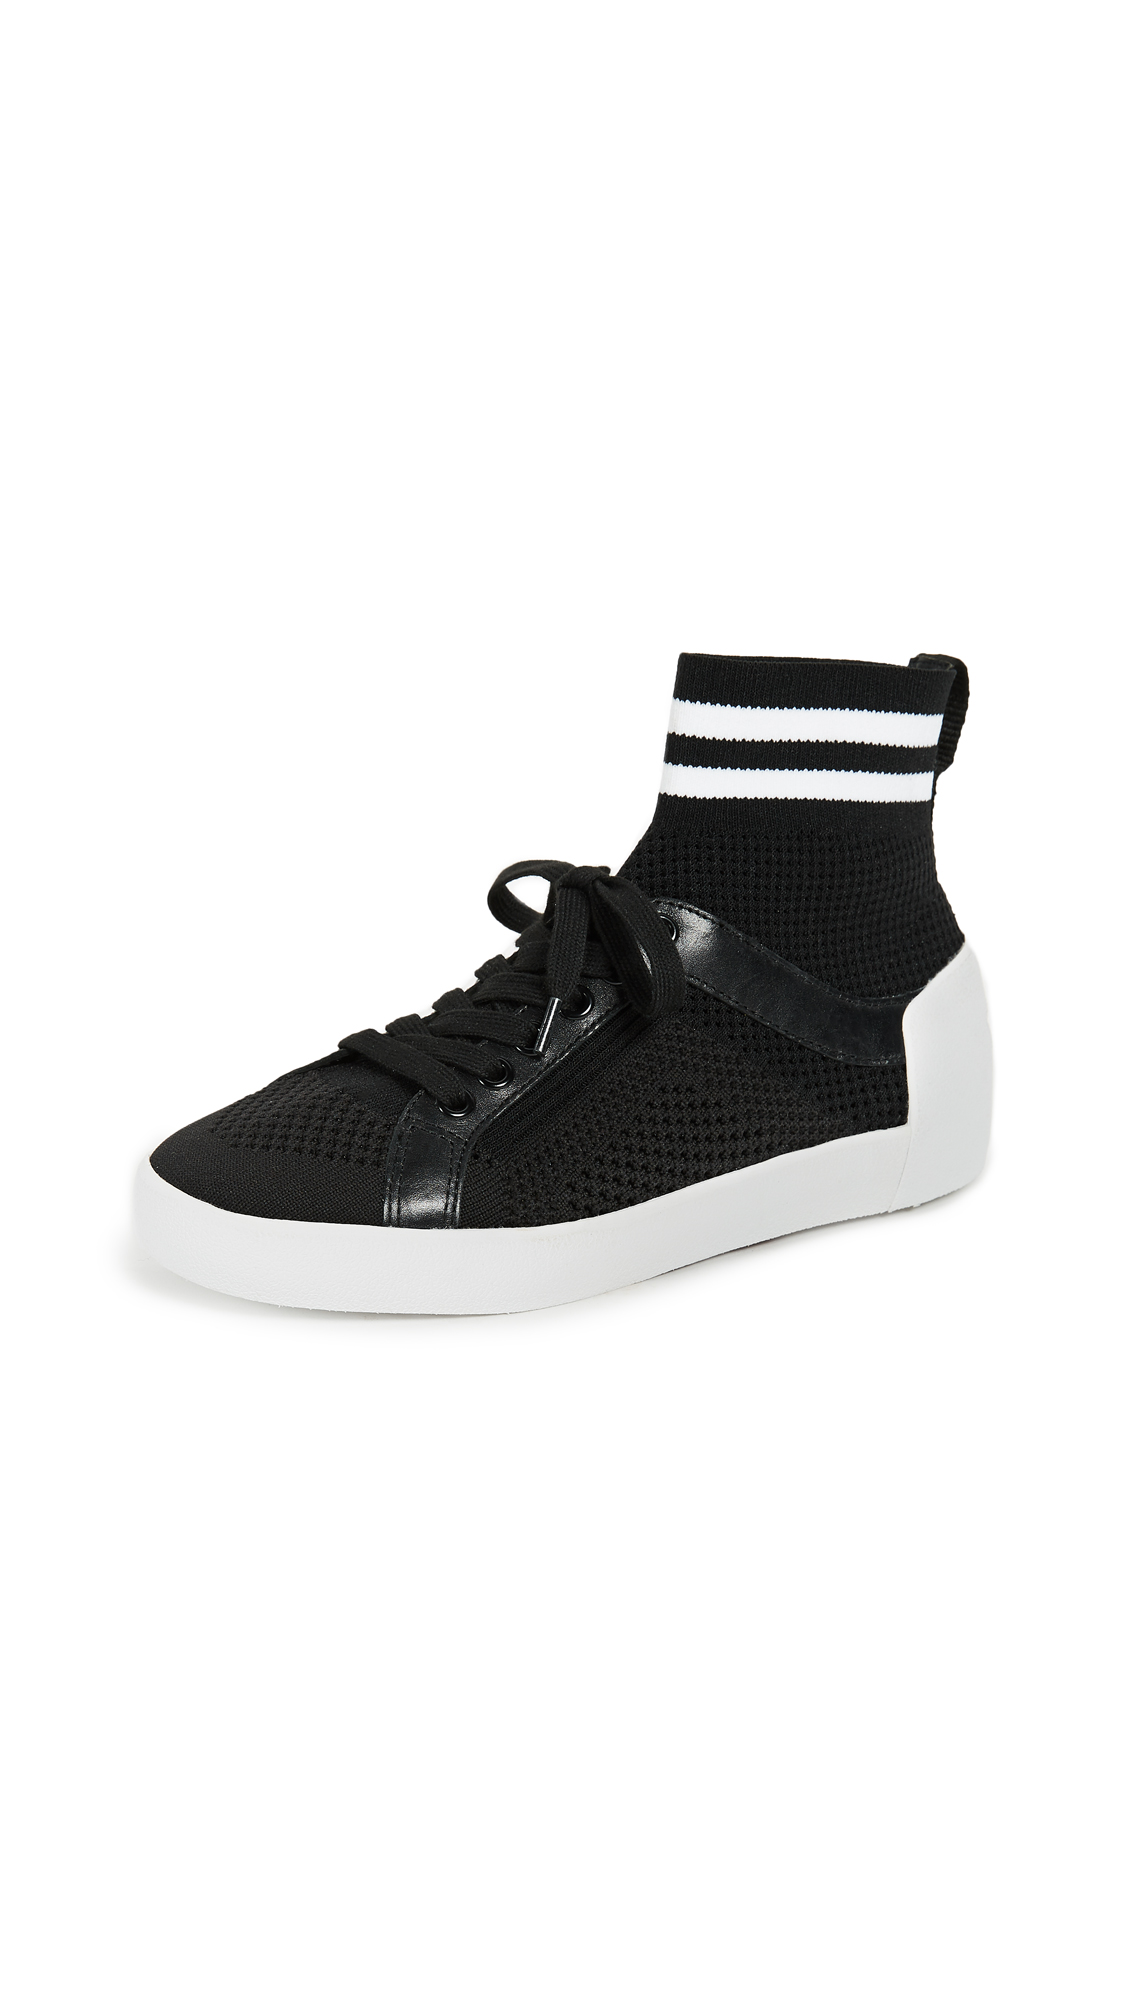 Ash Ninja Sneaker - Black/White